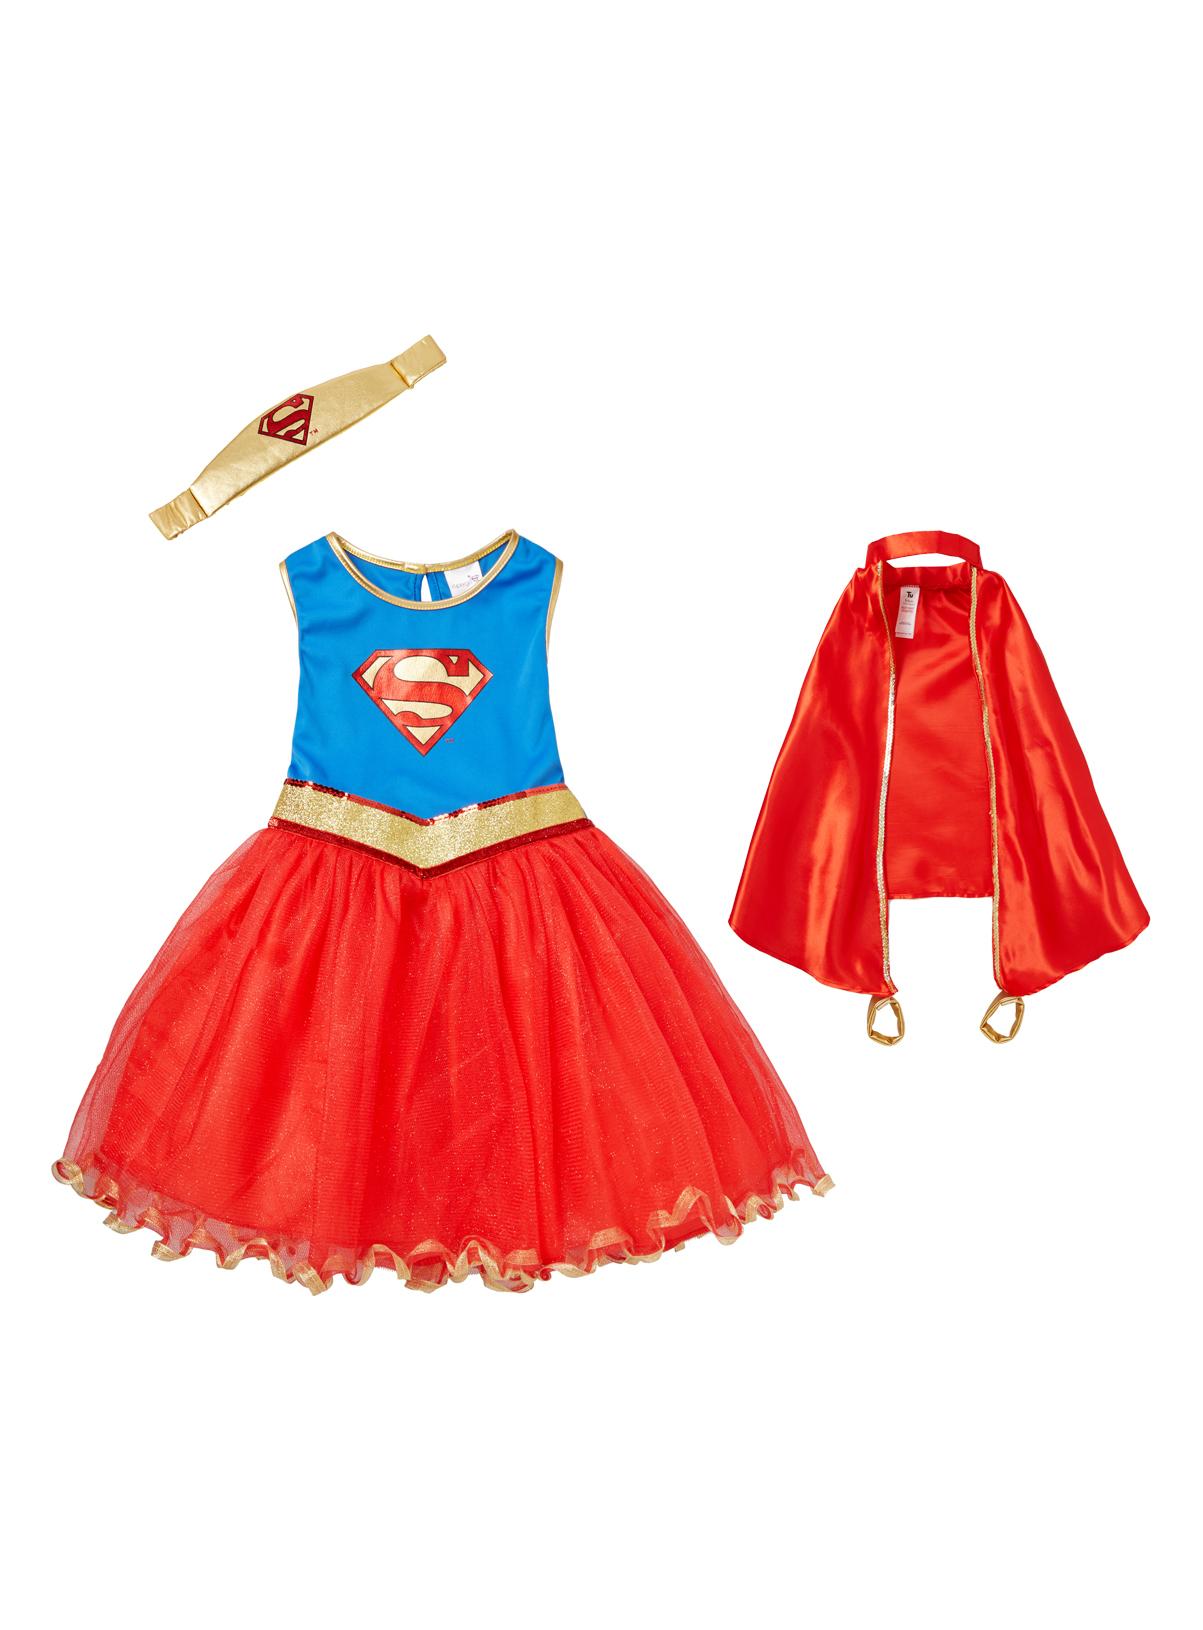 Childrens Dressing Gowns Sainsburys | Insured Fashion